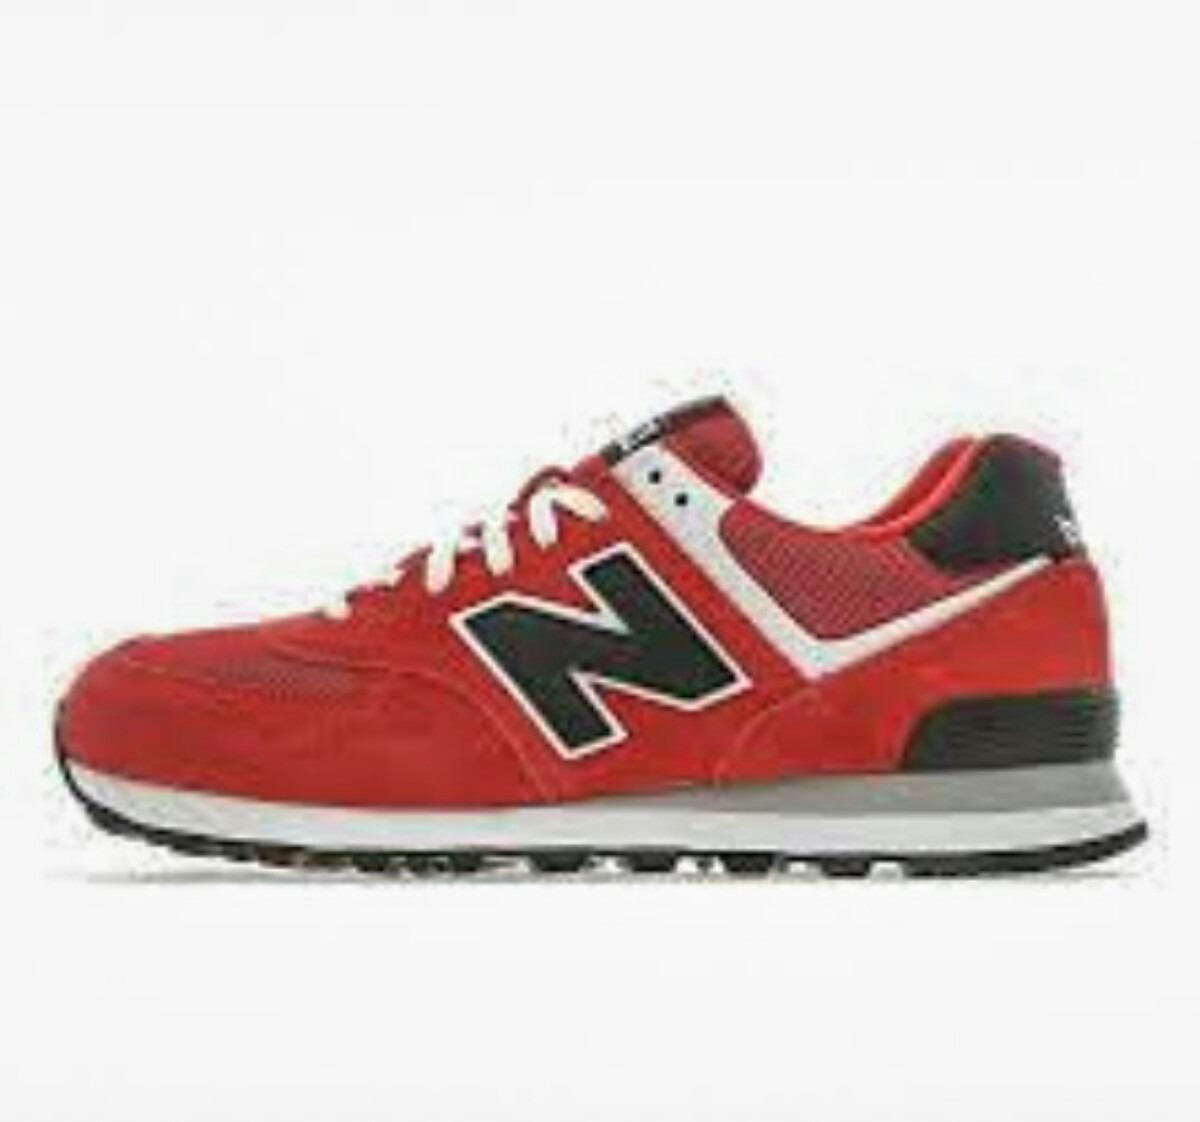 new balance 574 roja y negra